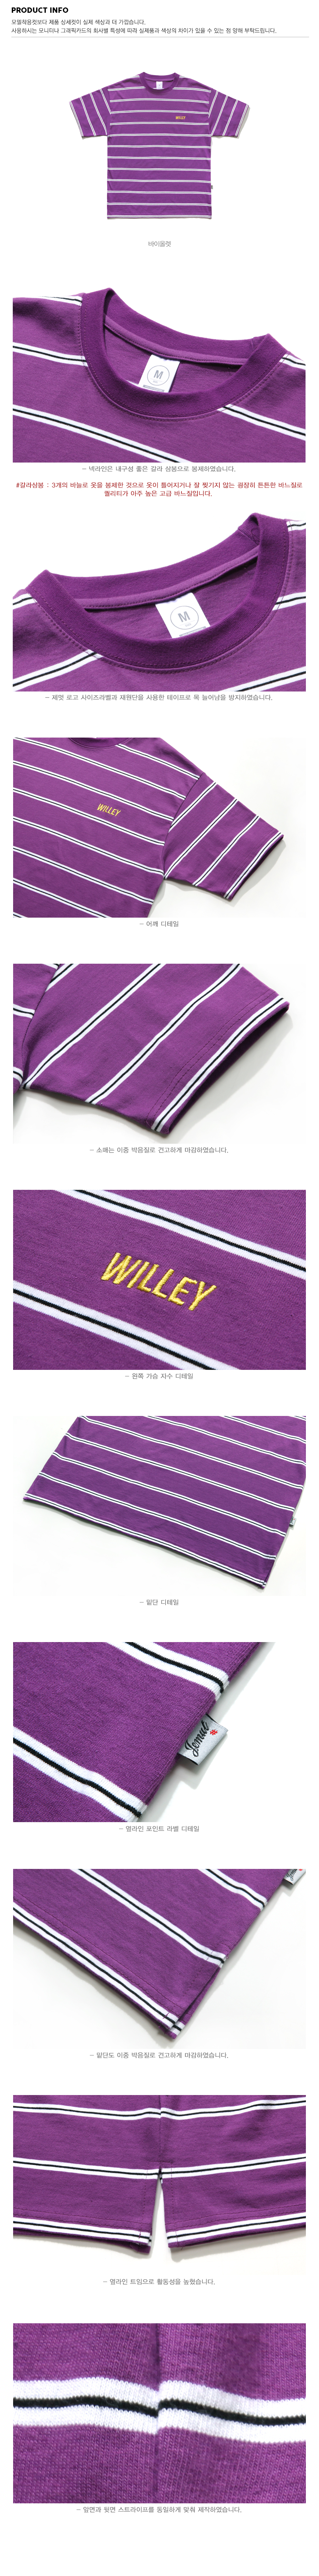 20180423_willey_stripe_t-shirts_violet_kj.jpg